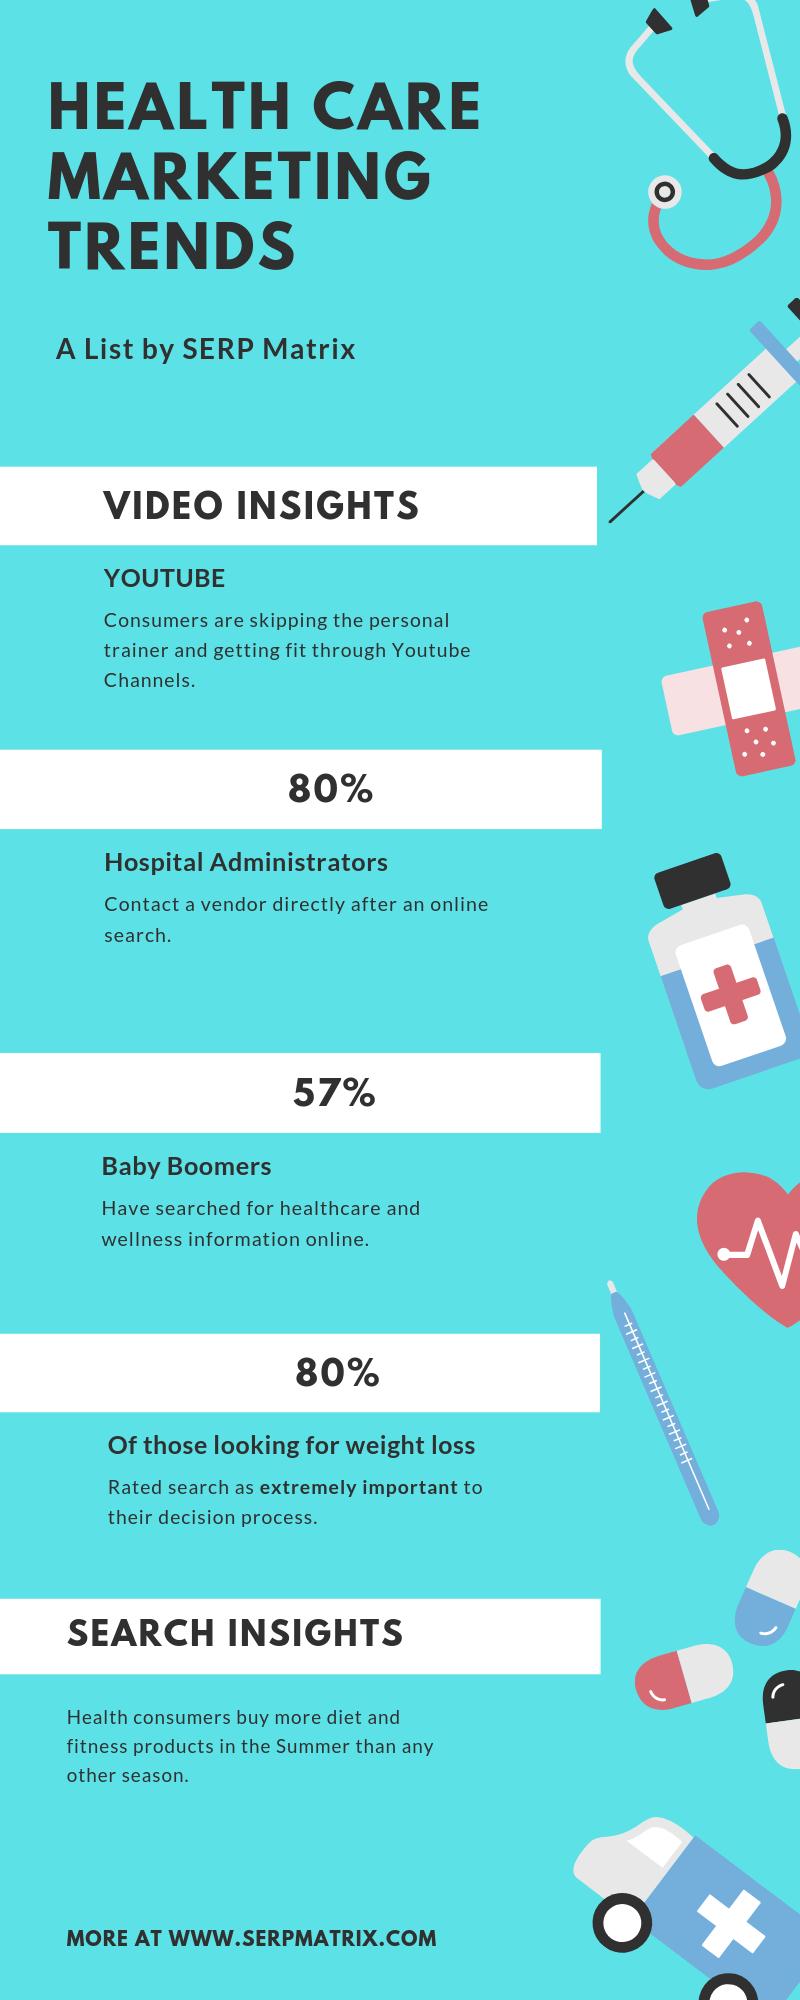 SERP Matrix Health Care Marketing Trends